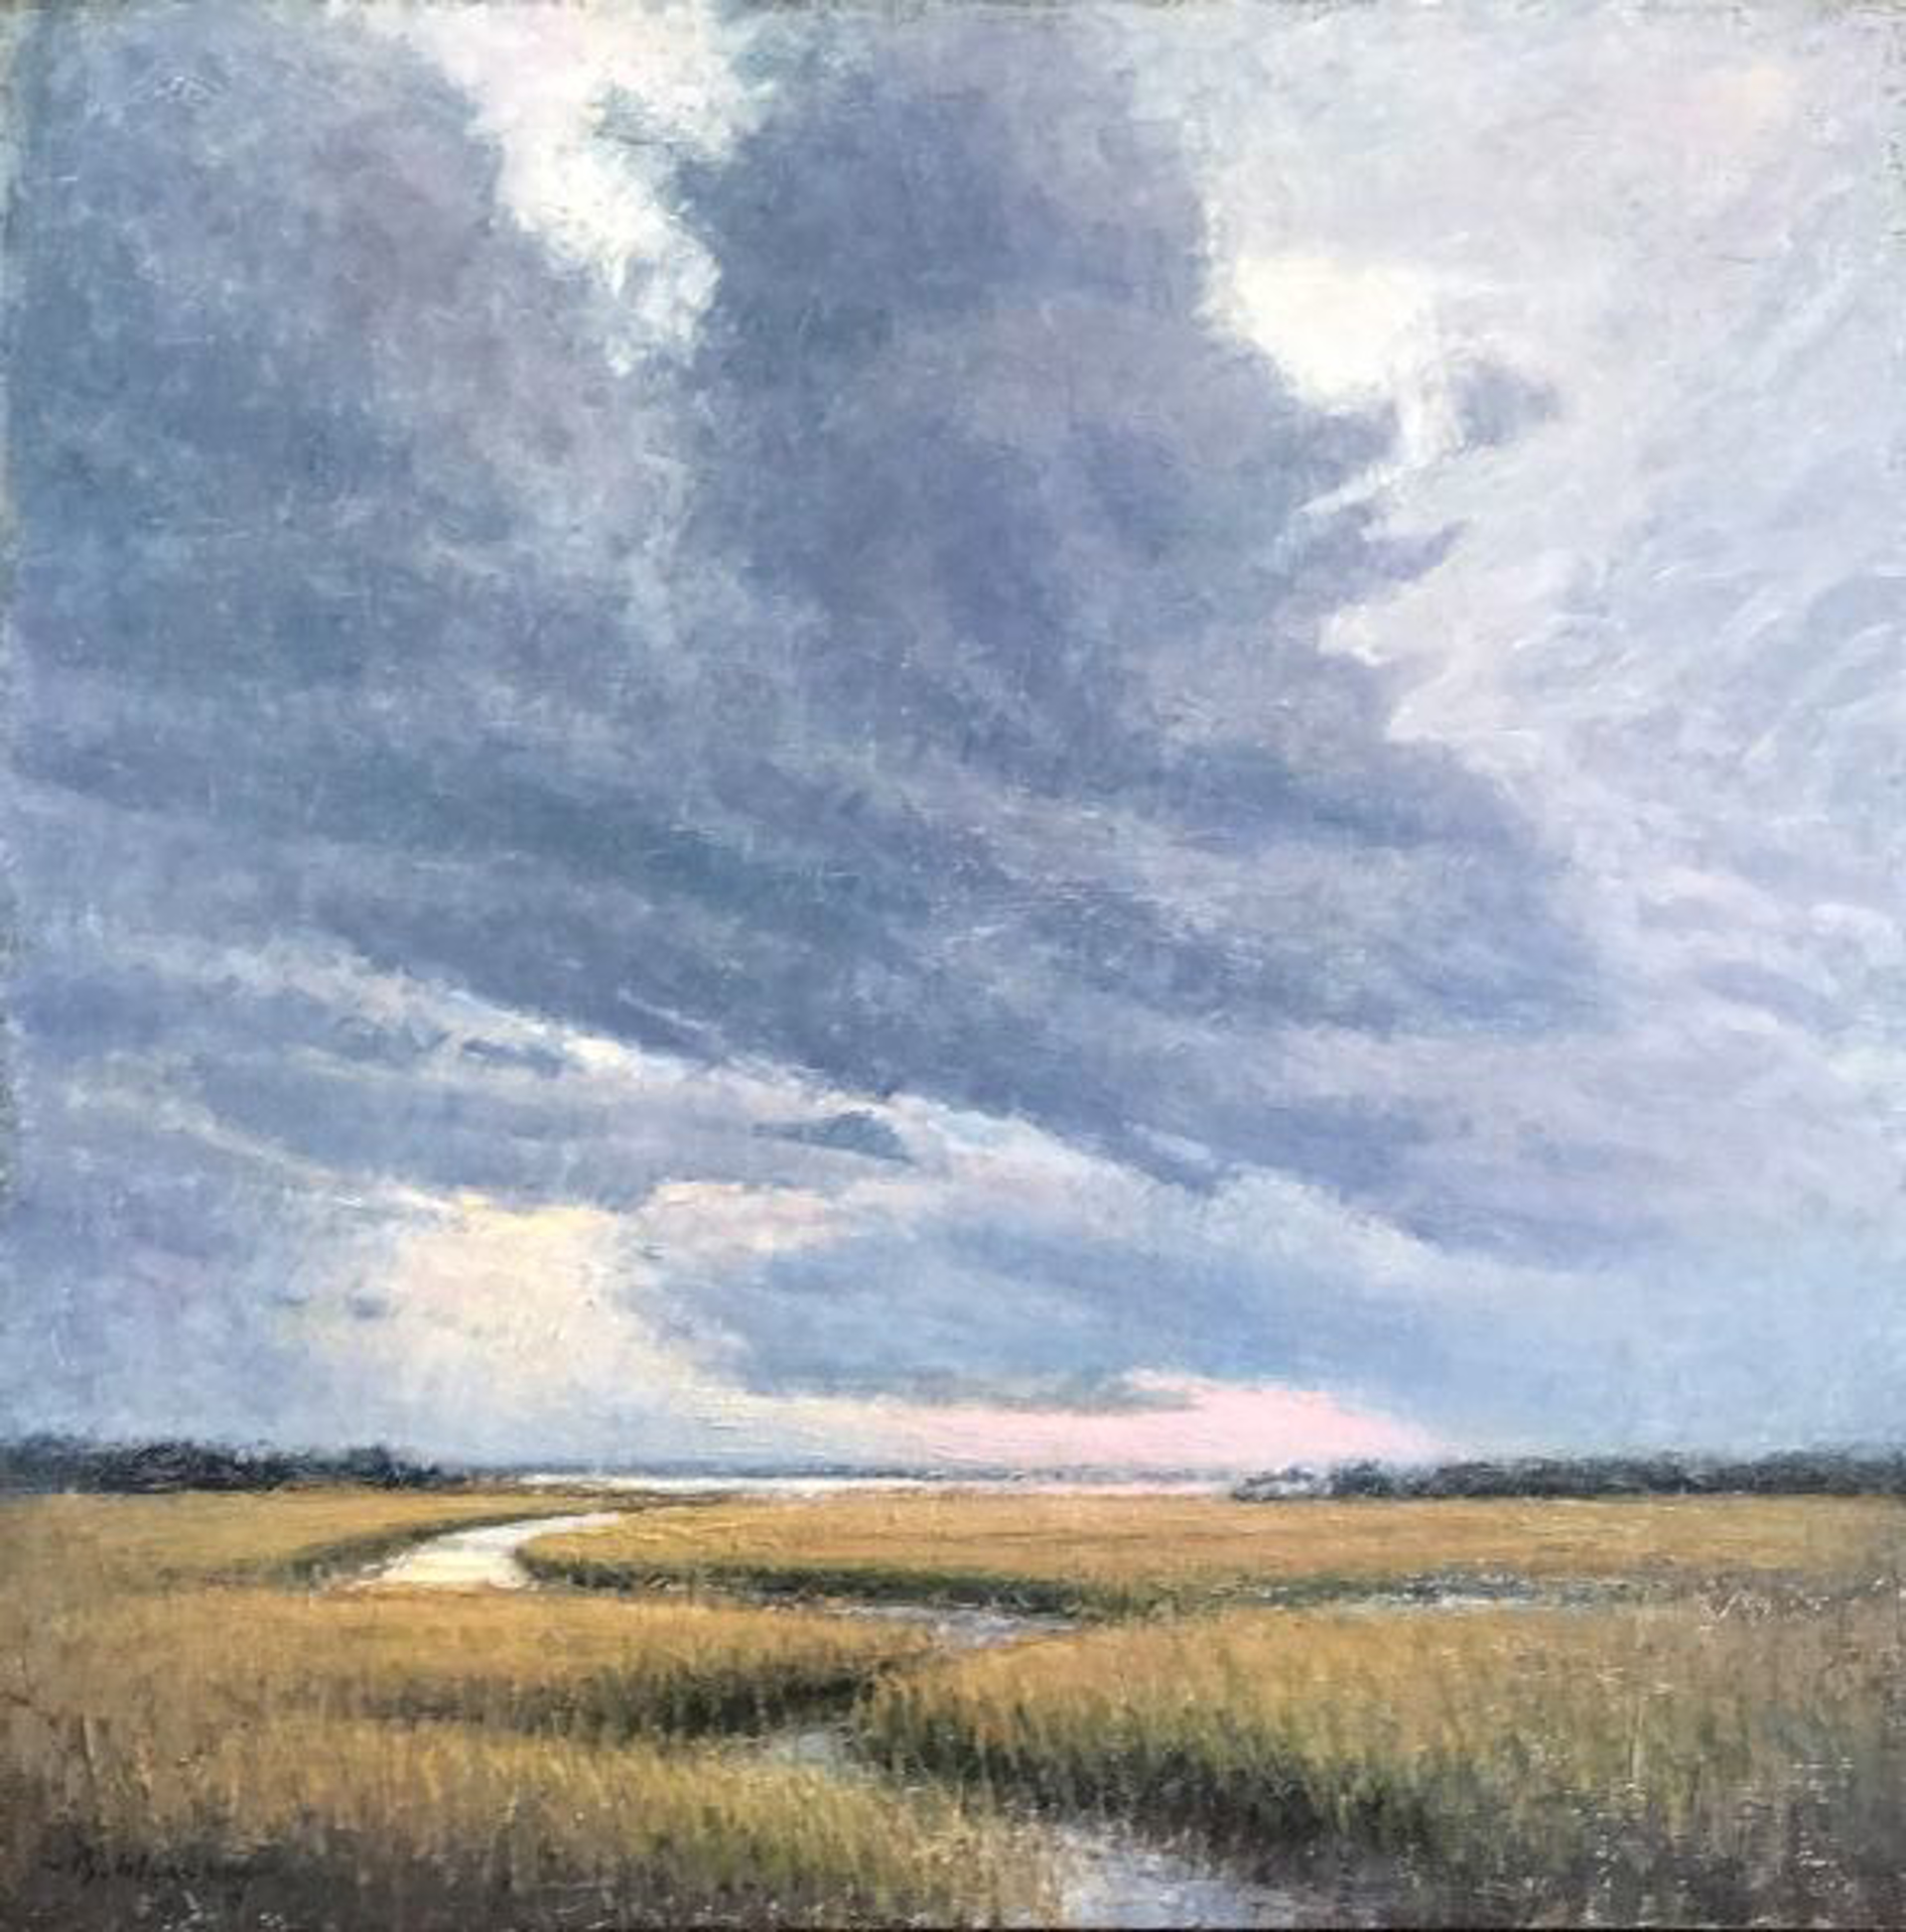 Passing Clouds by Brett Weaver